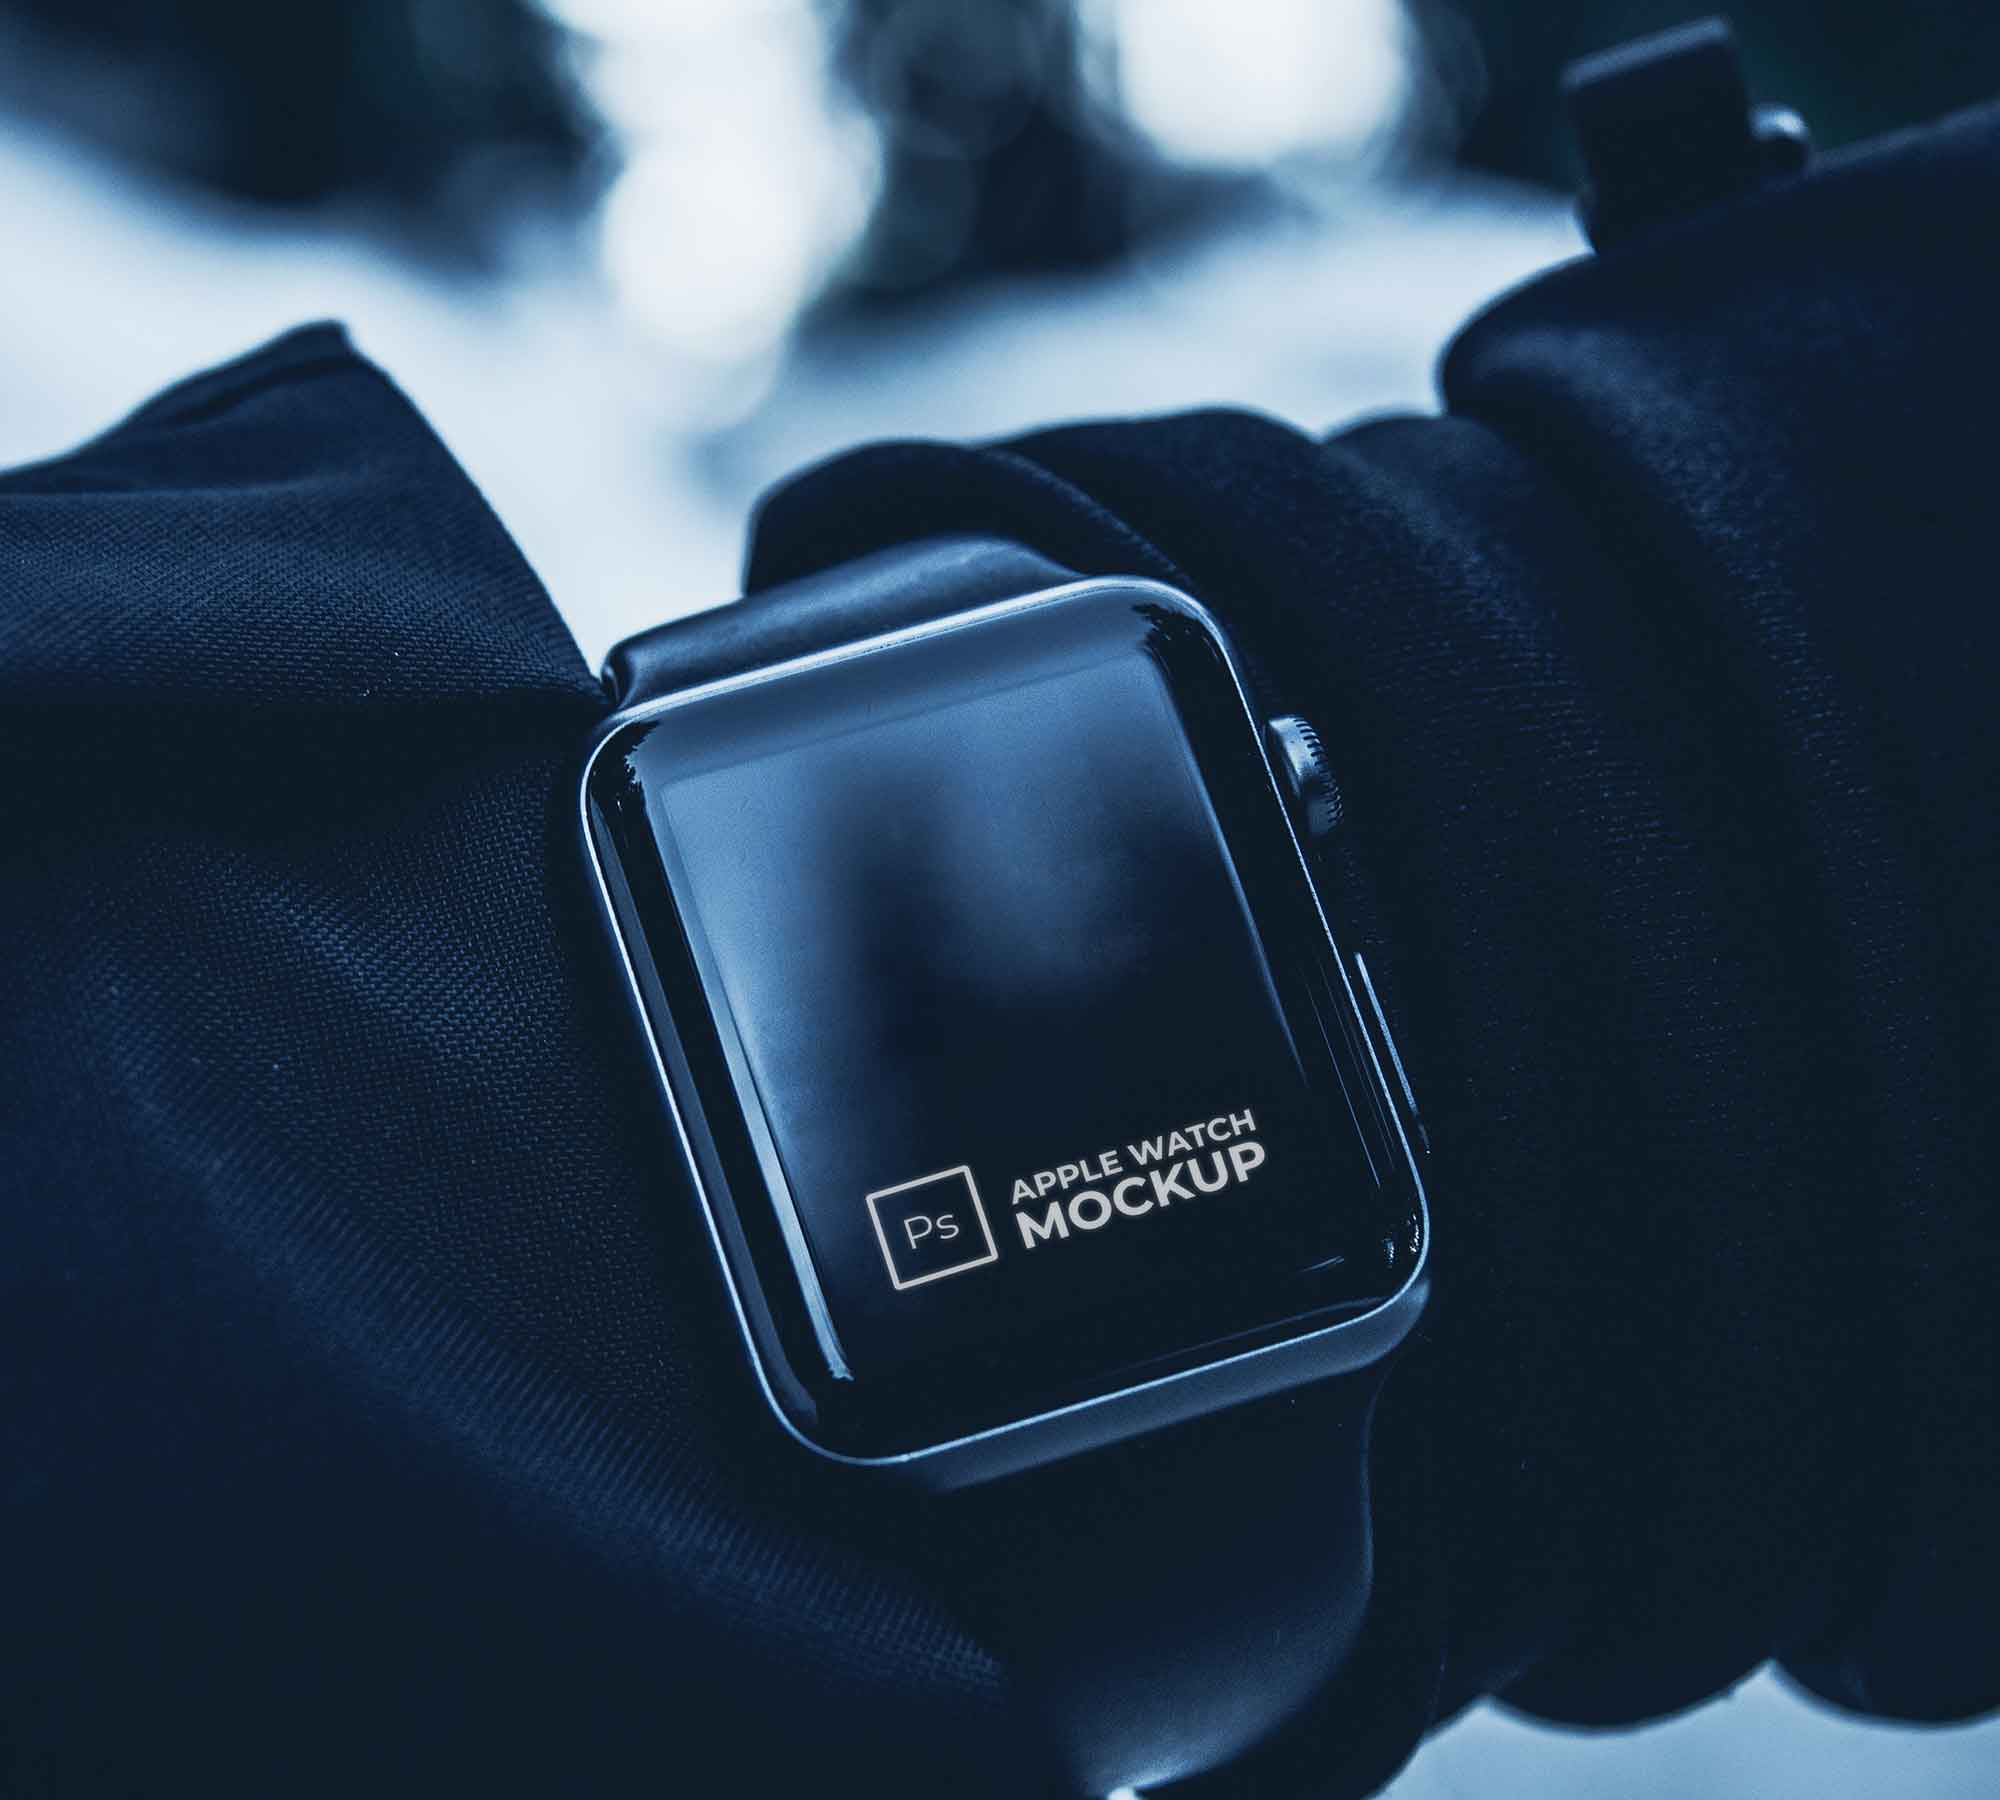 In Hand Apple Watch Mockup